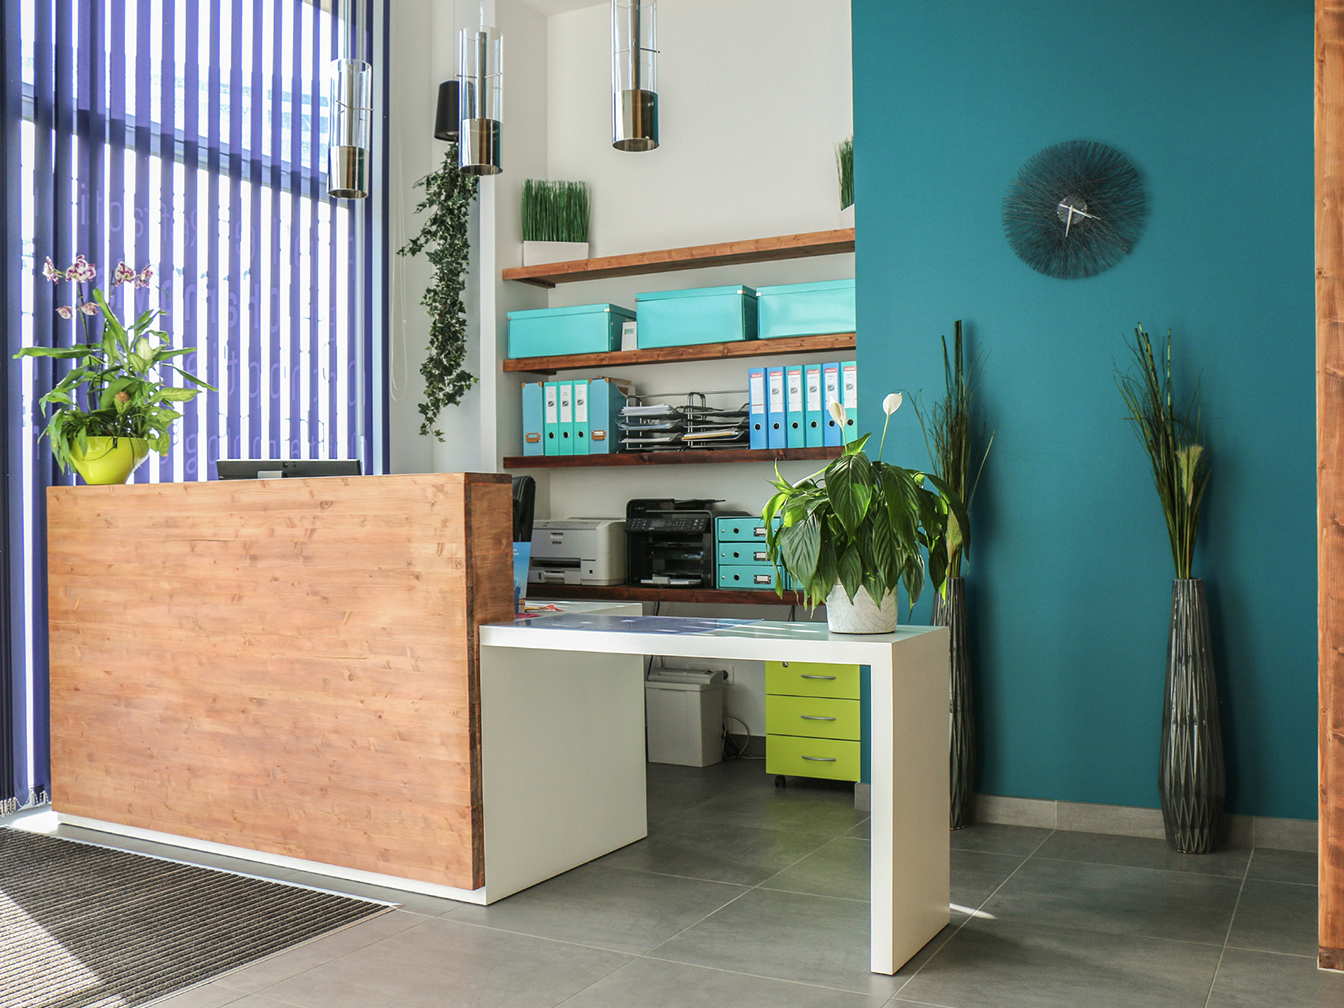 Accueil cabinet d'ophtalmologie